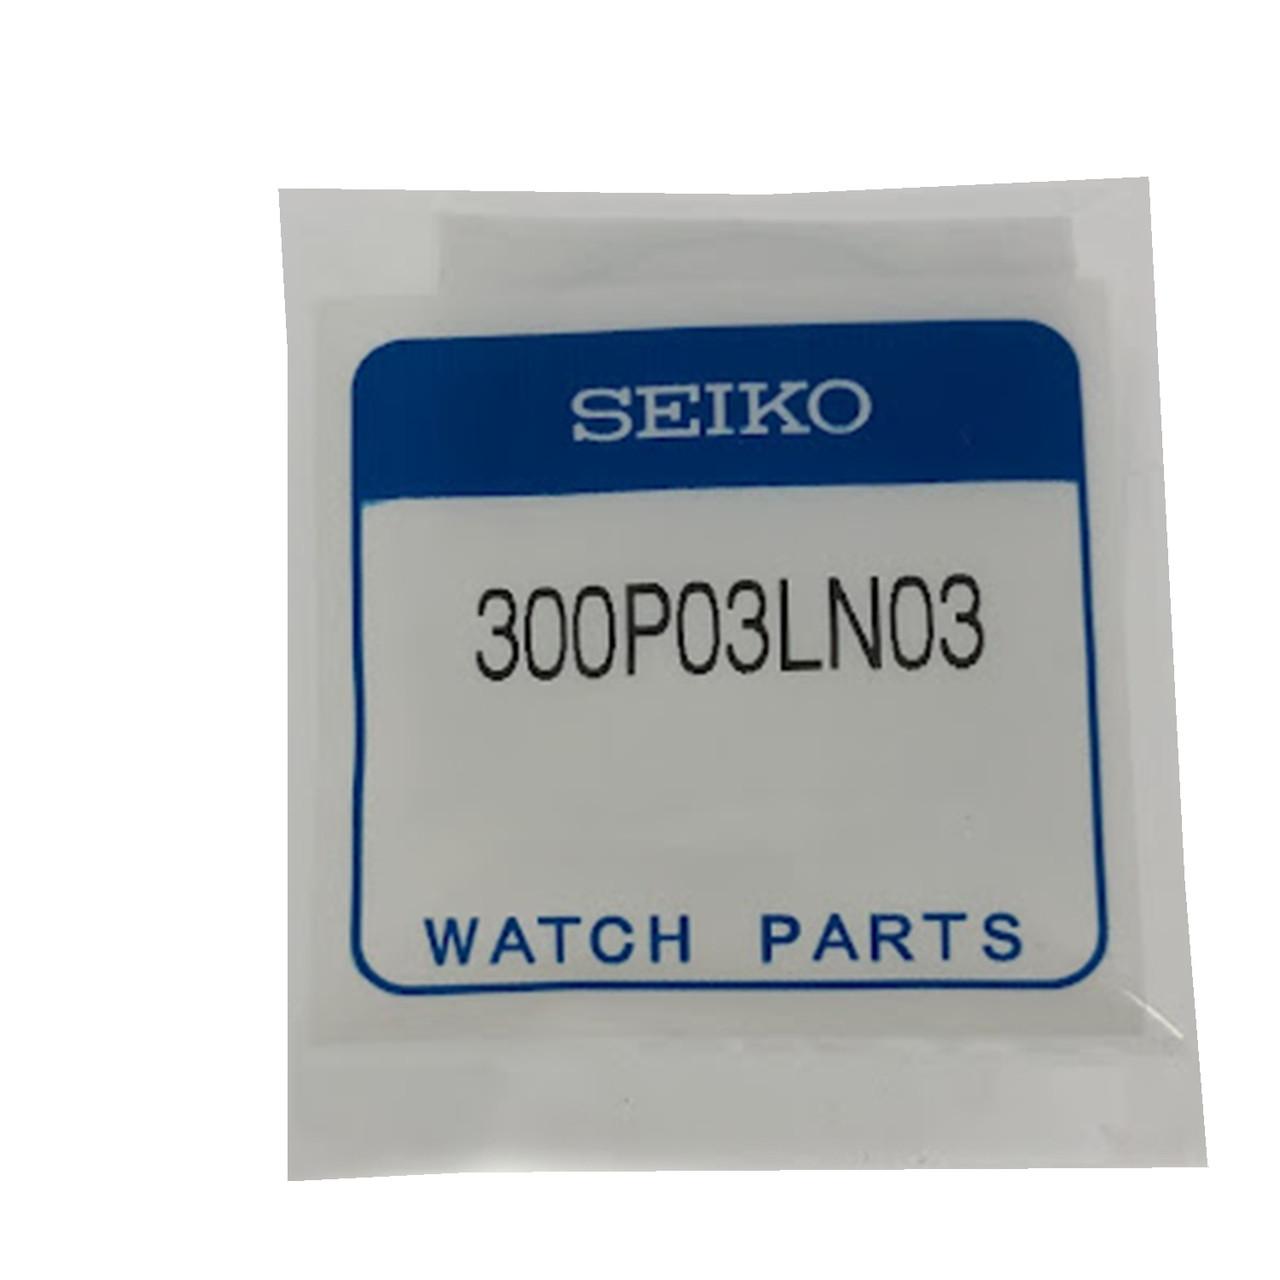 Seiko 300P03LN03 crystal